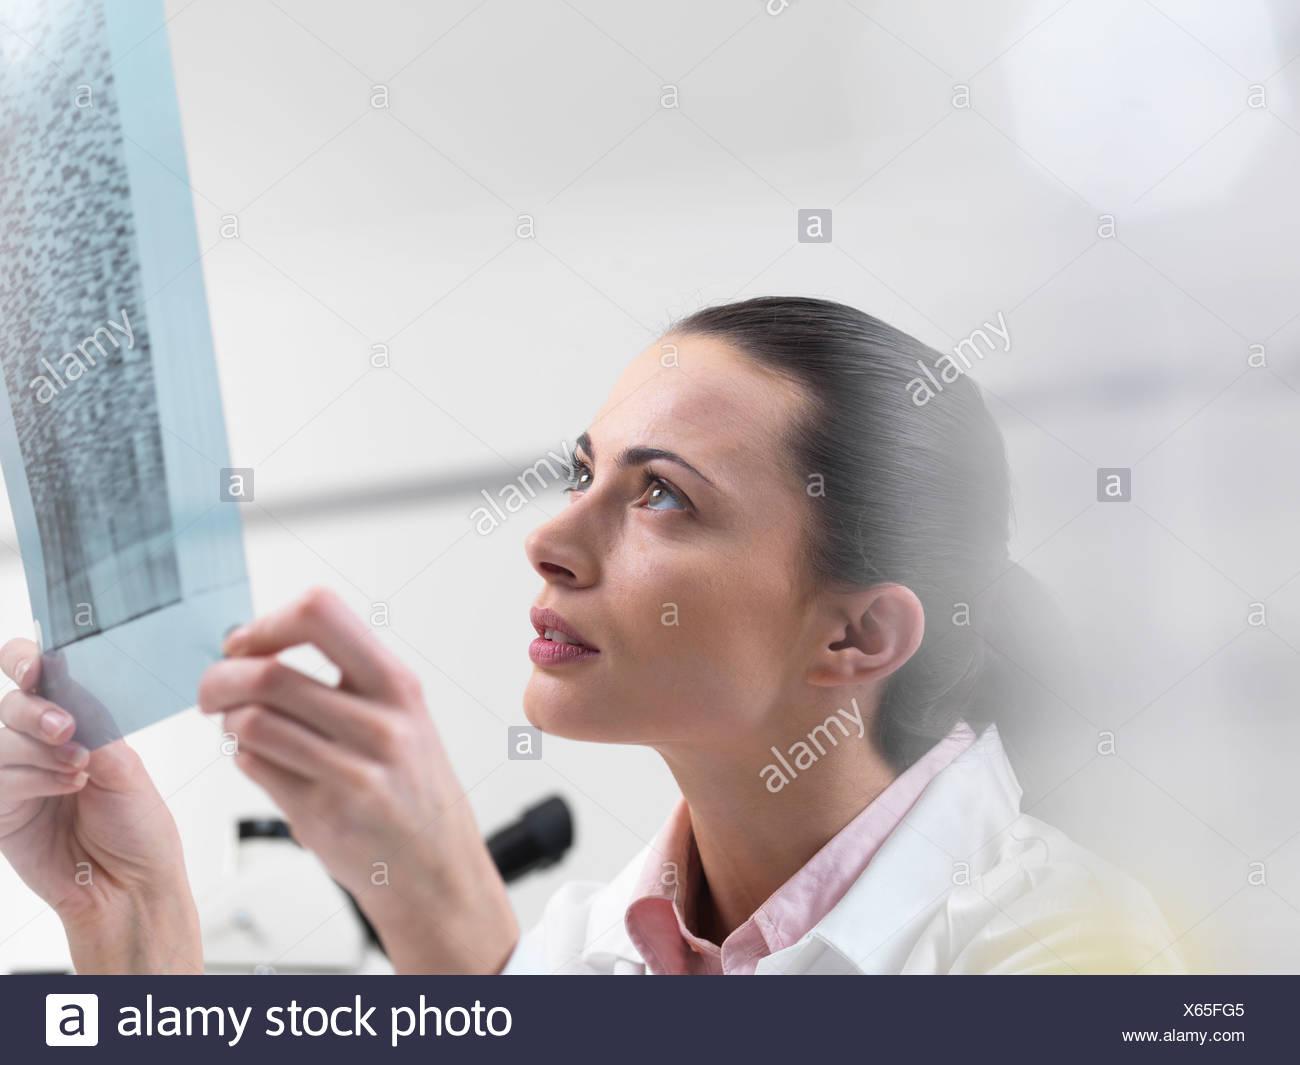 Scientist examining DNA sequencing gel - Stock Image